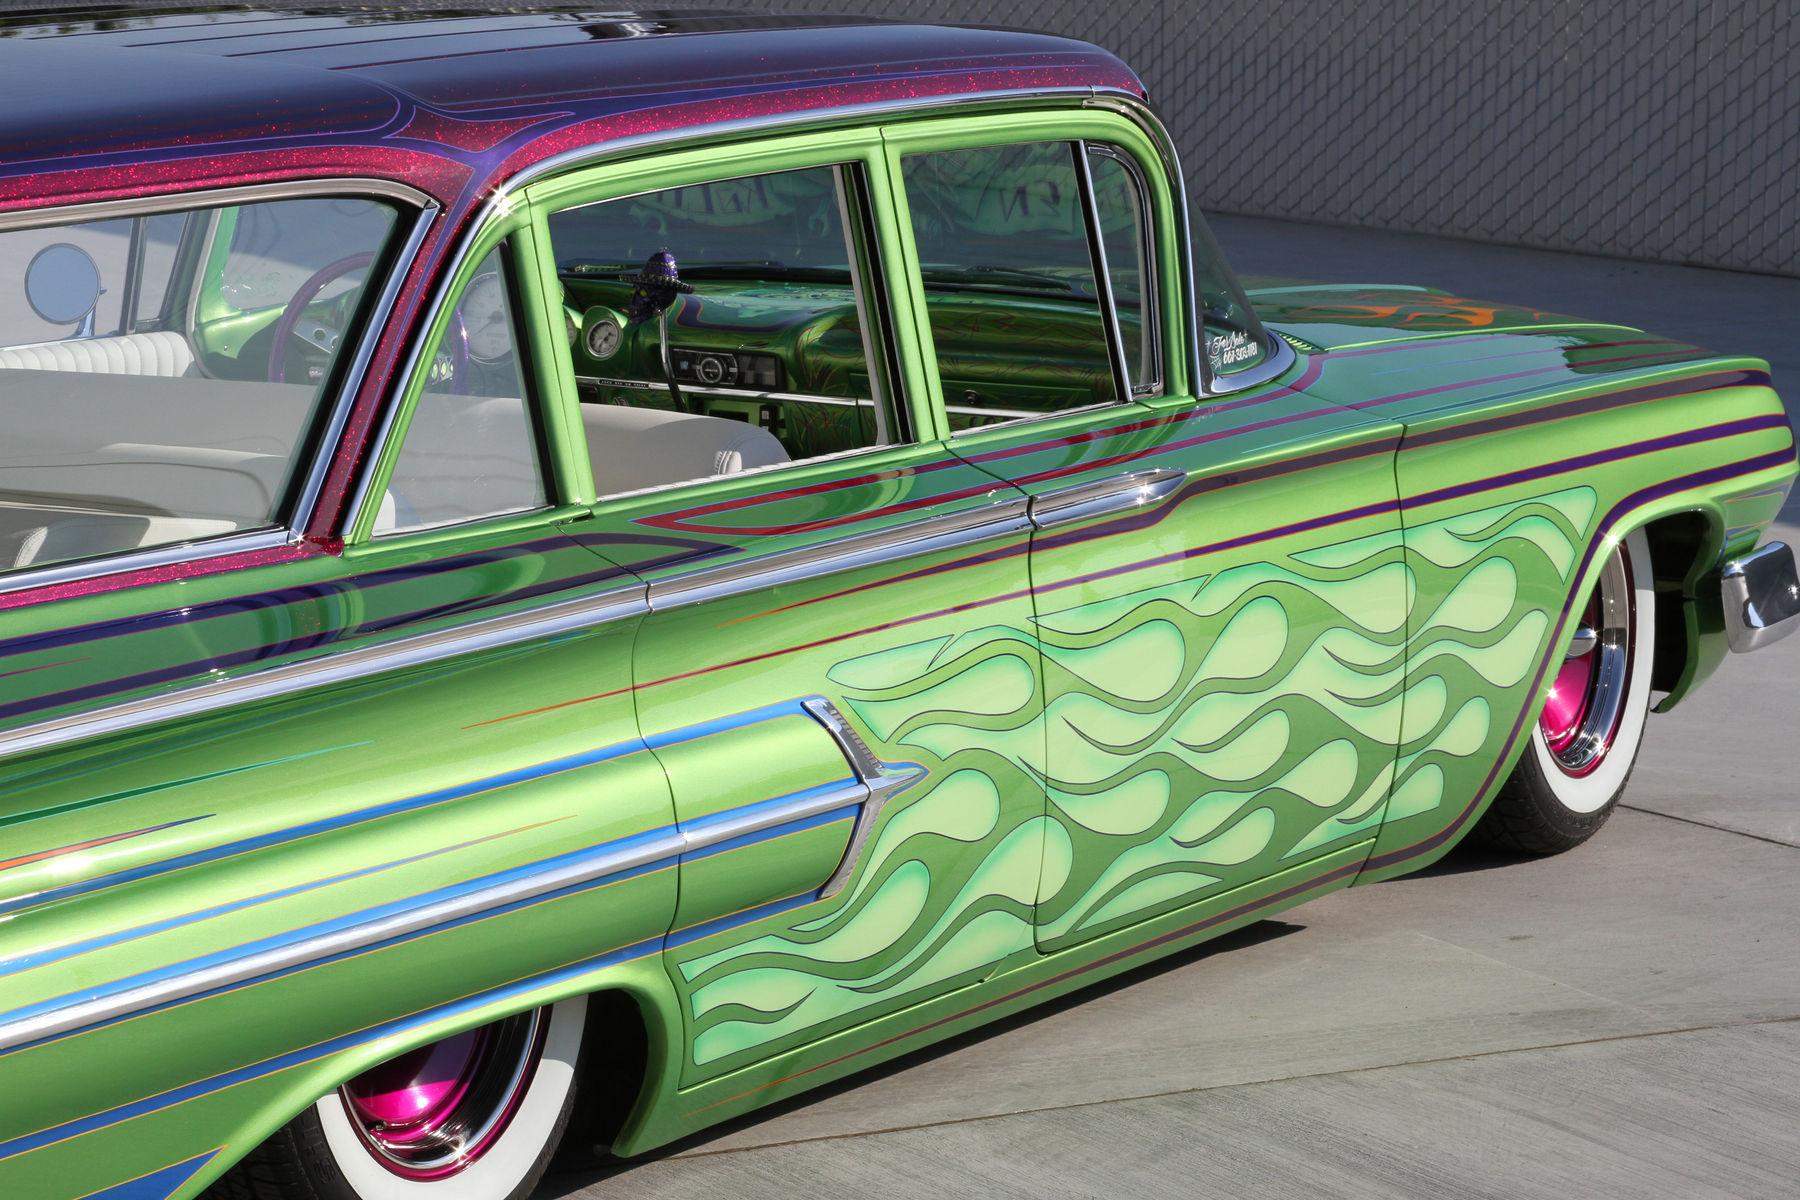 1958 Chevrolet  | Rob's '58 Nomad Wagon